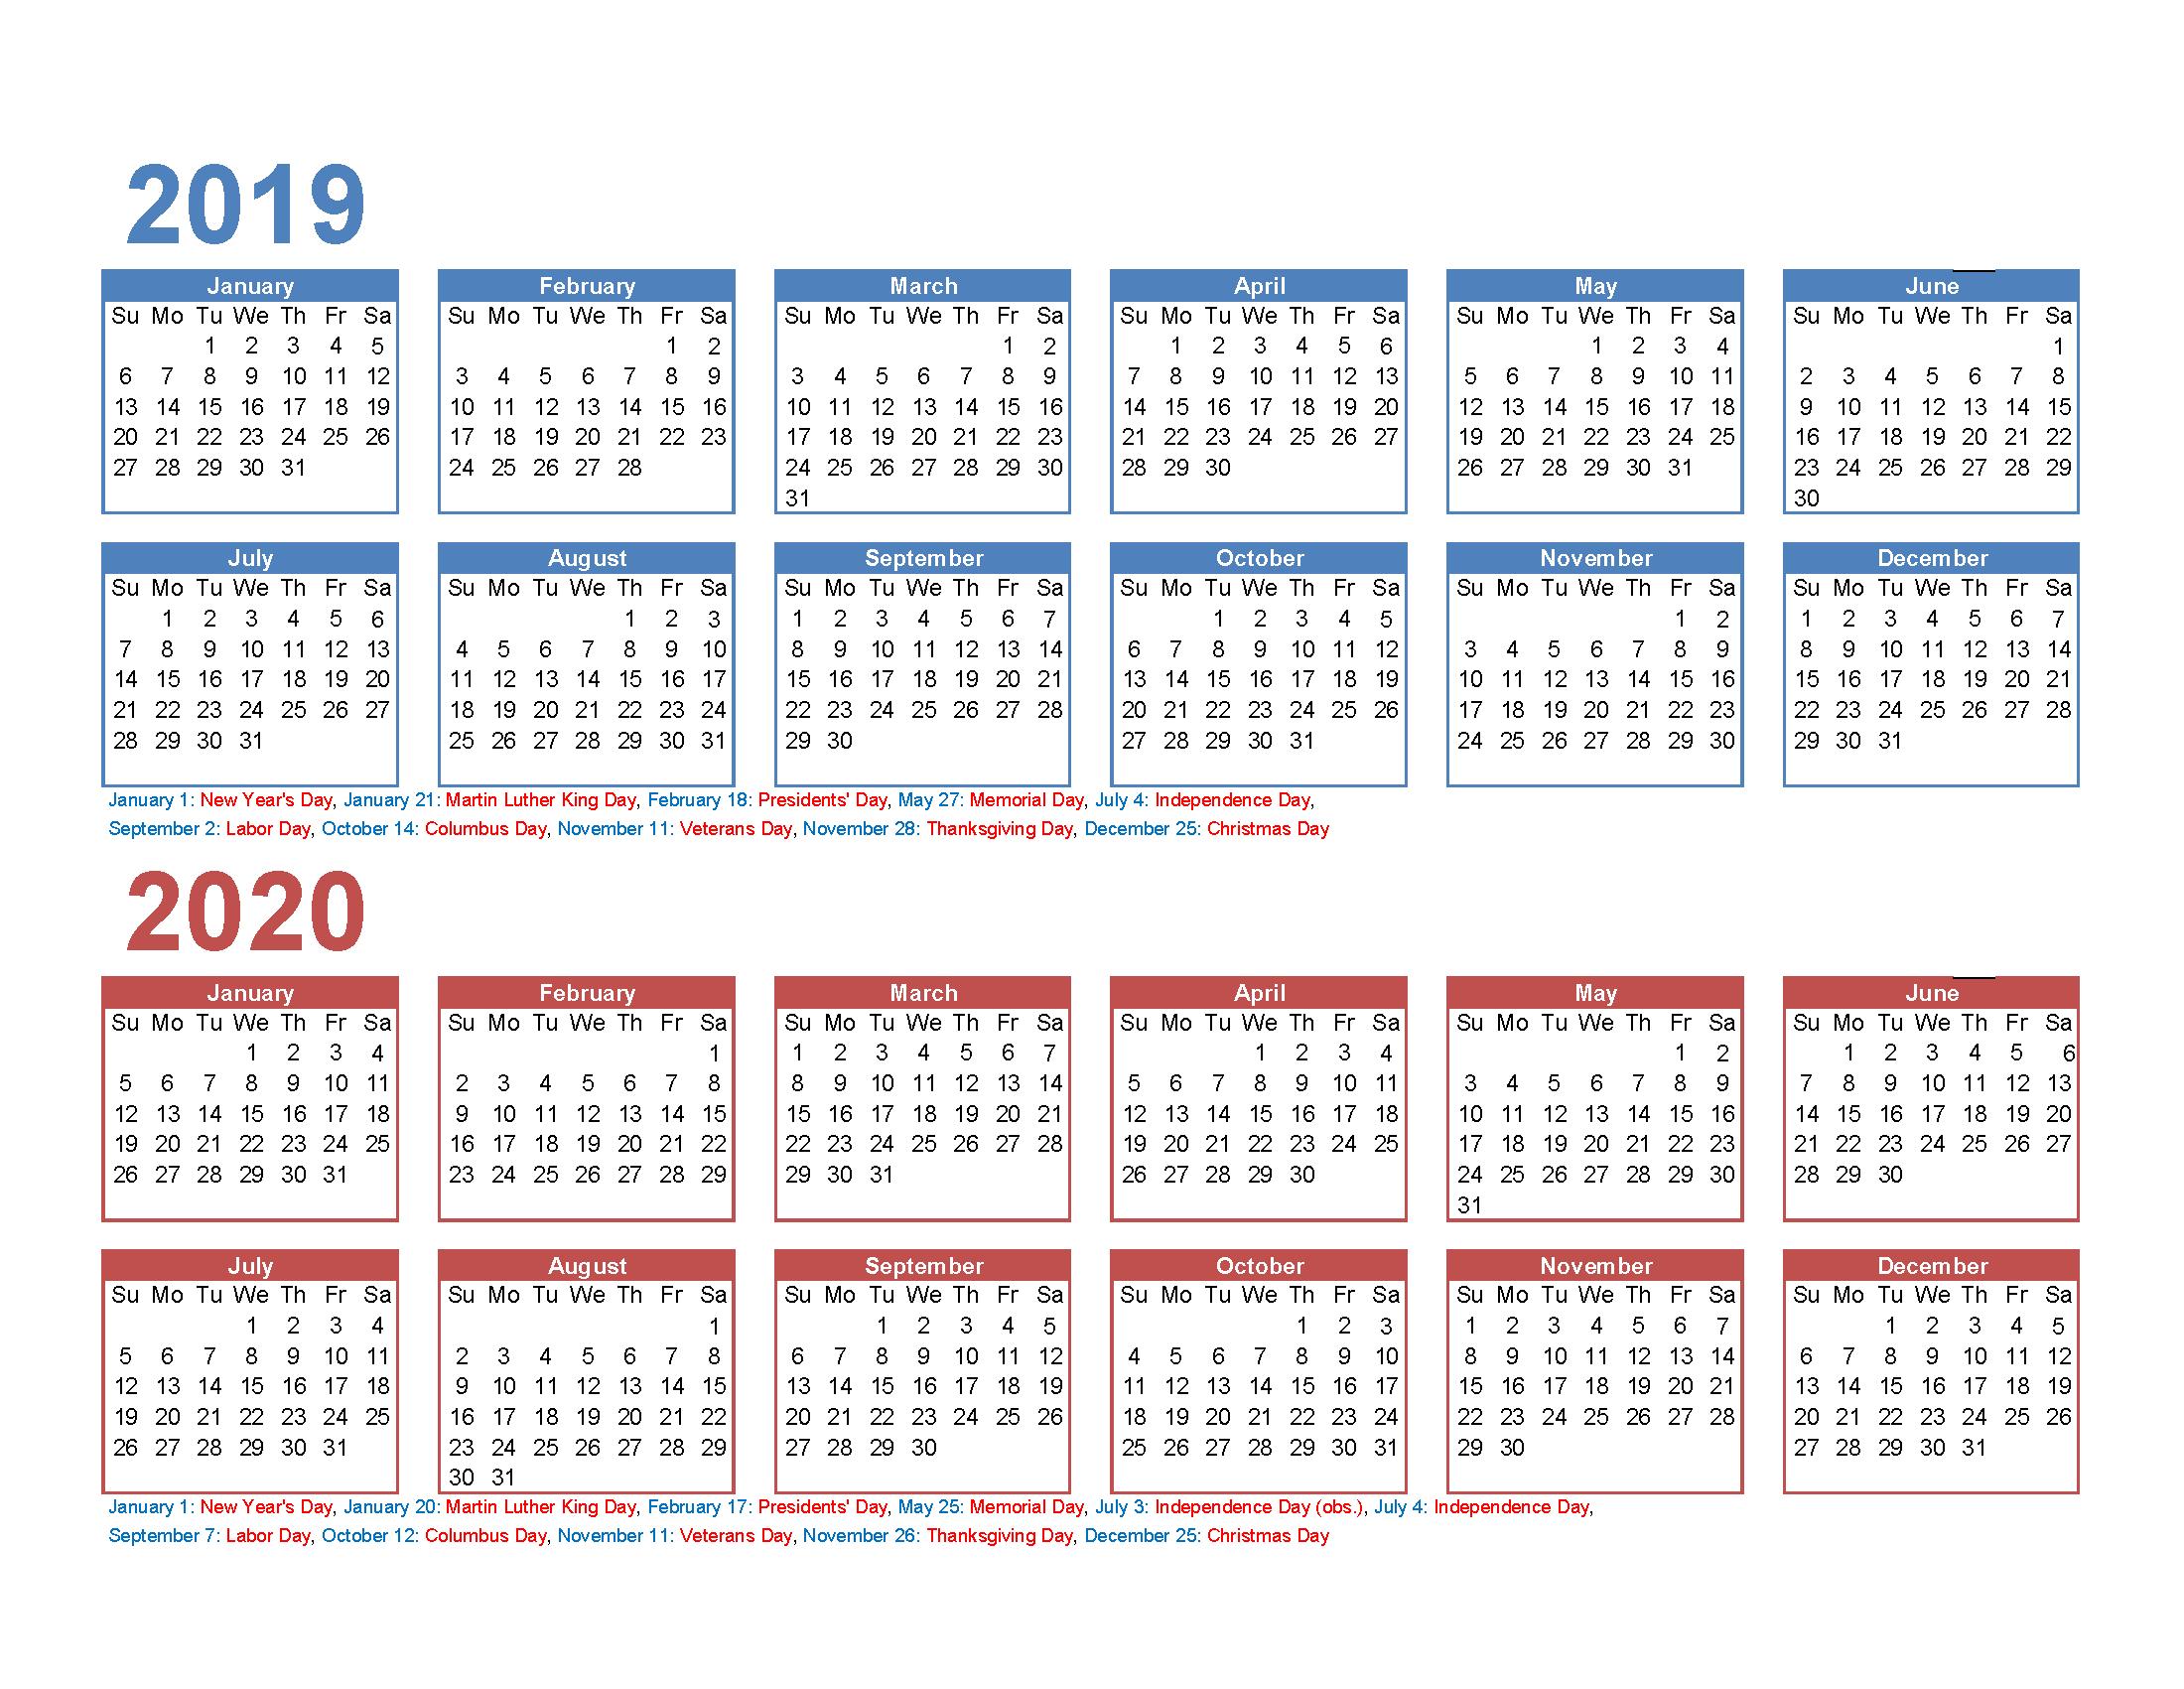 Free 2019 And 2020 Calendar Printable 2 Year Calendar | Free 4 Year Printable Calendar